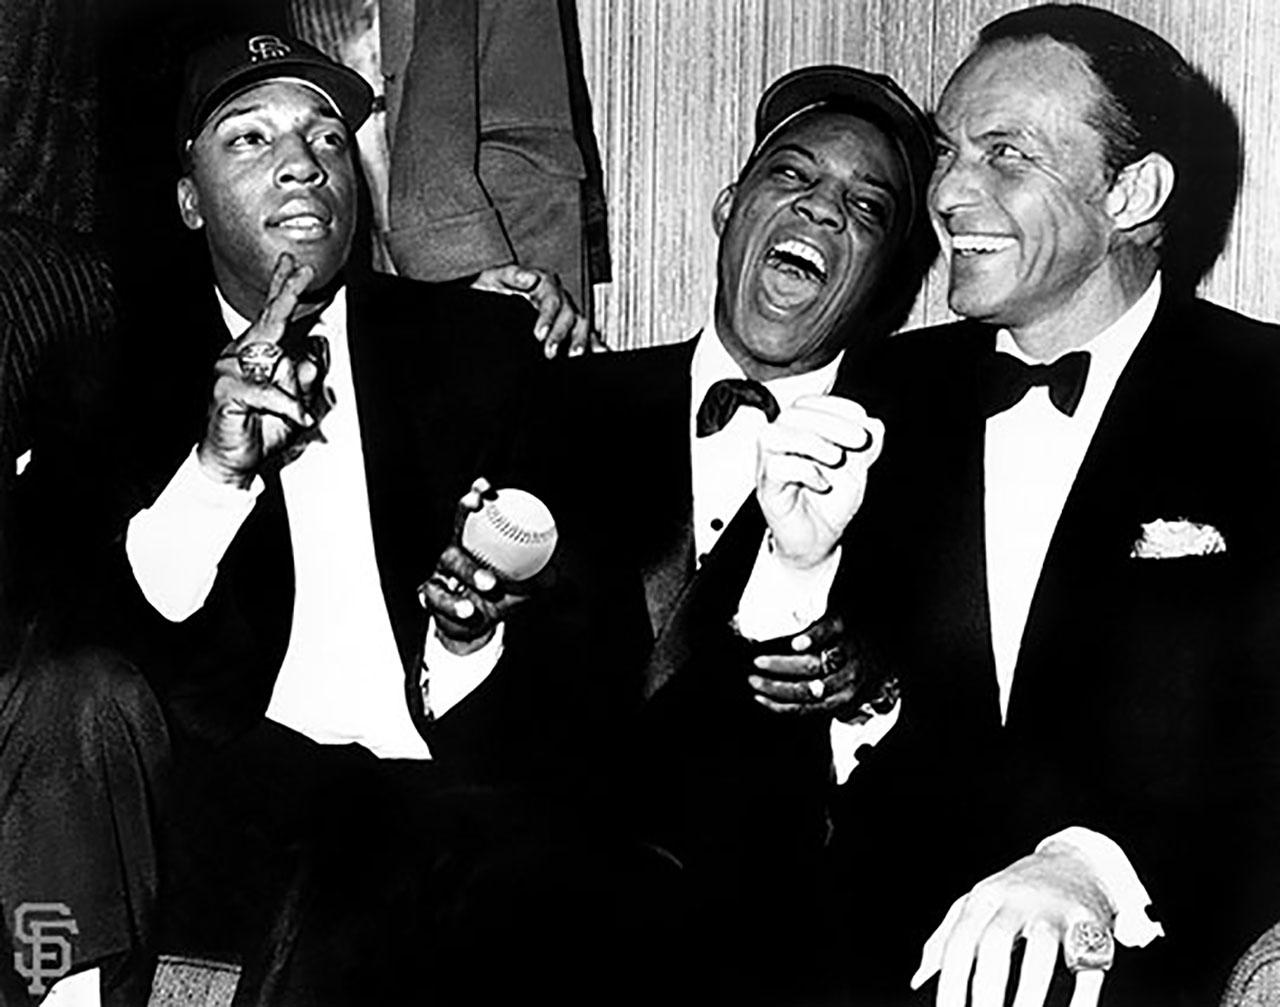 Sinatra Giants